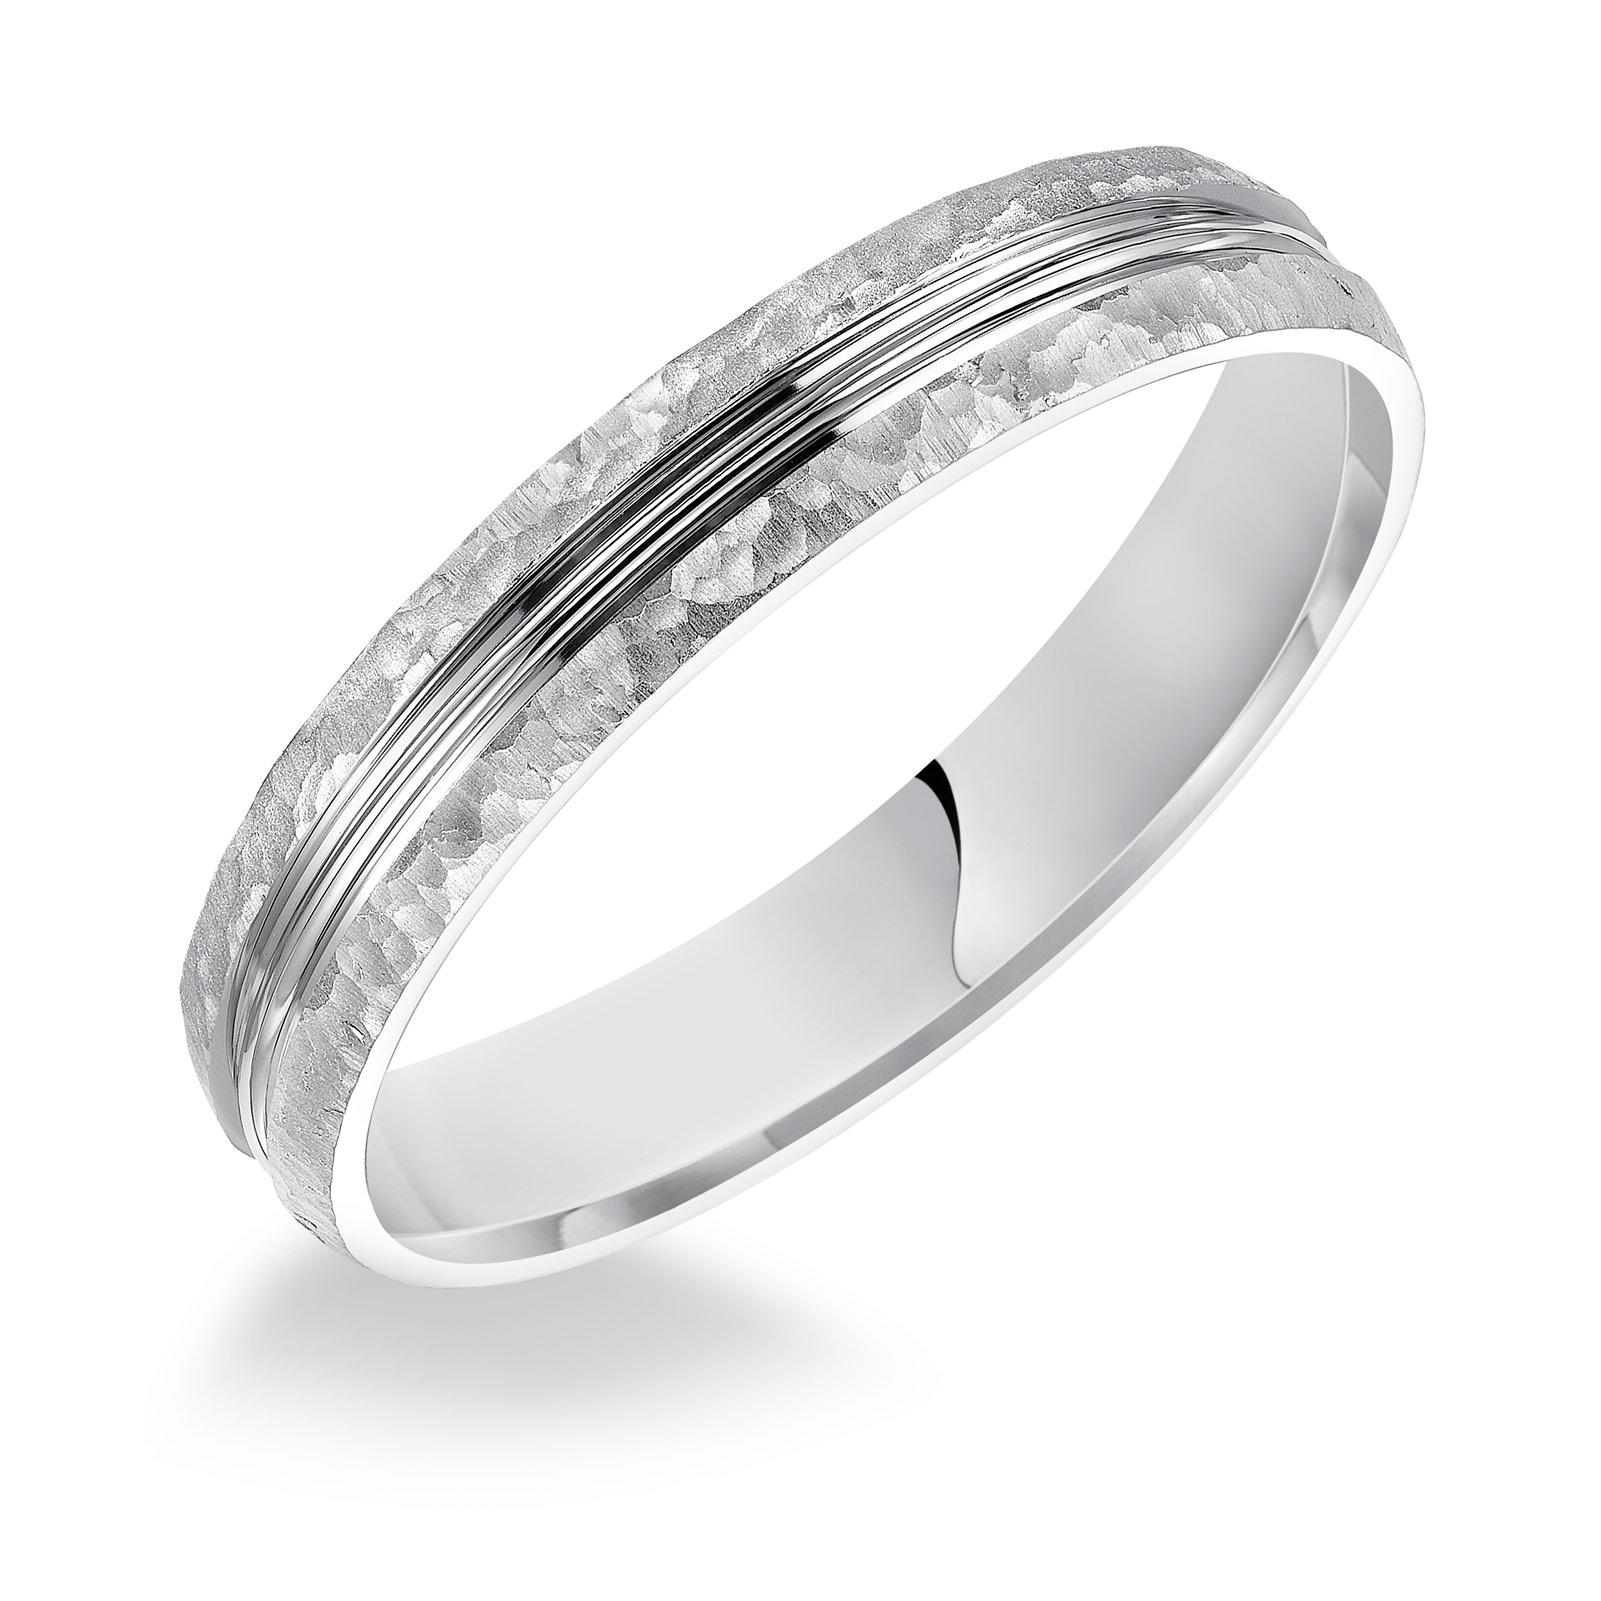 Goldman ring 11 11k4w4 g00 long island ny mens wedding for Long island wedding bands